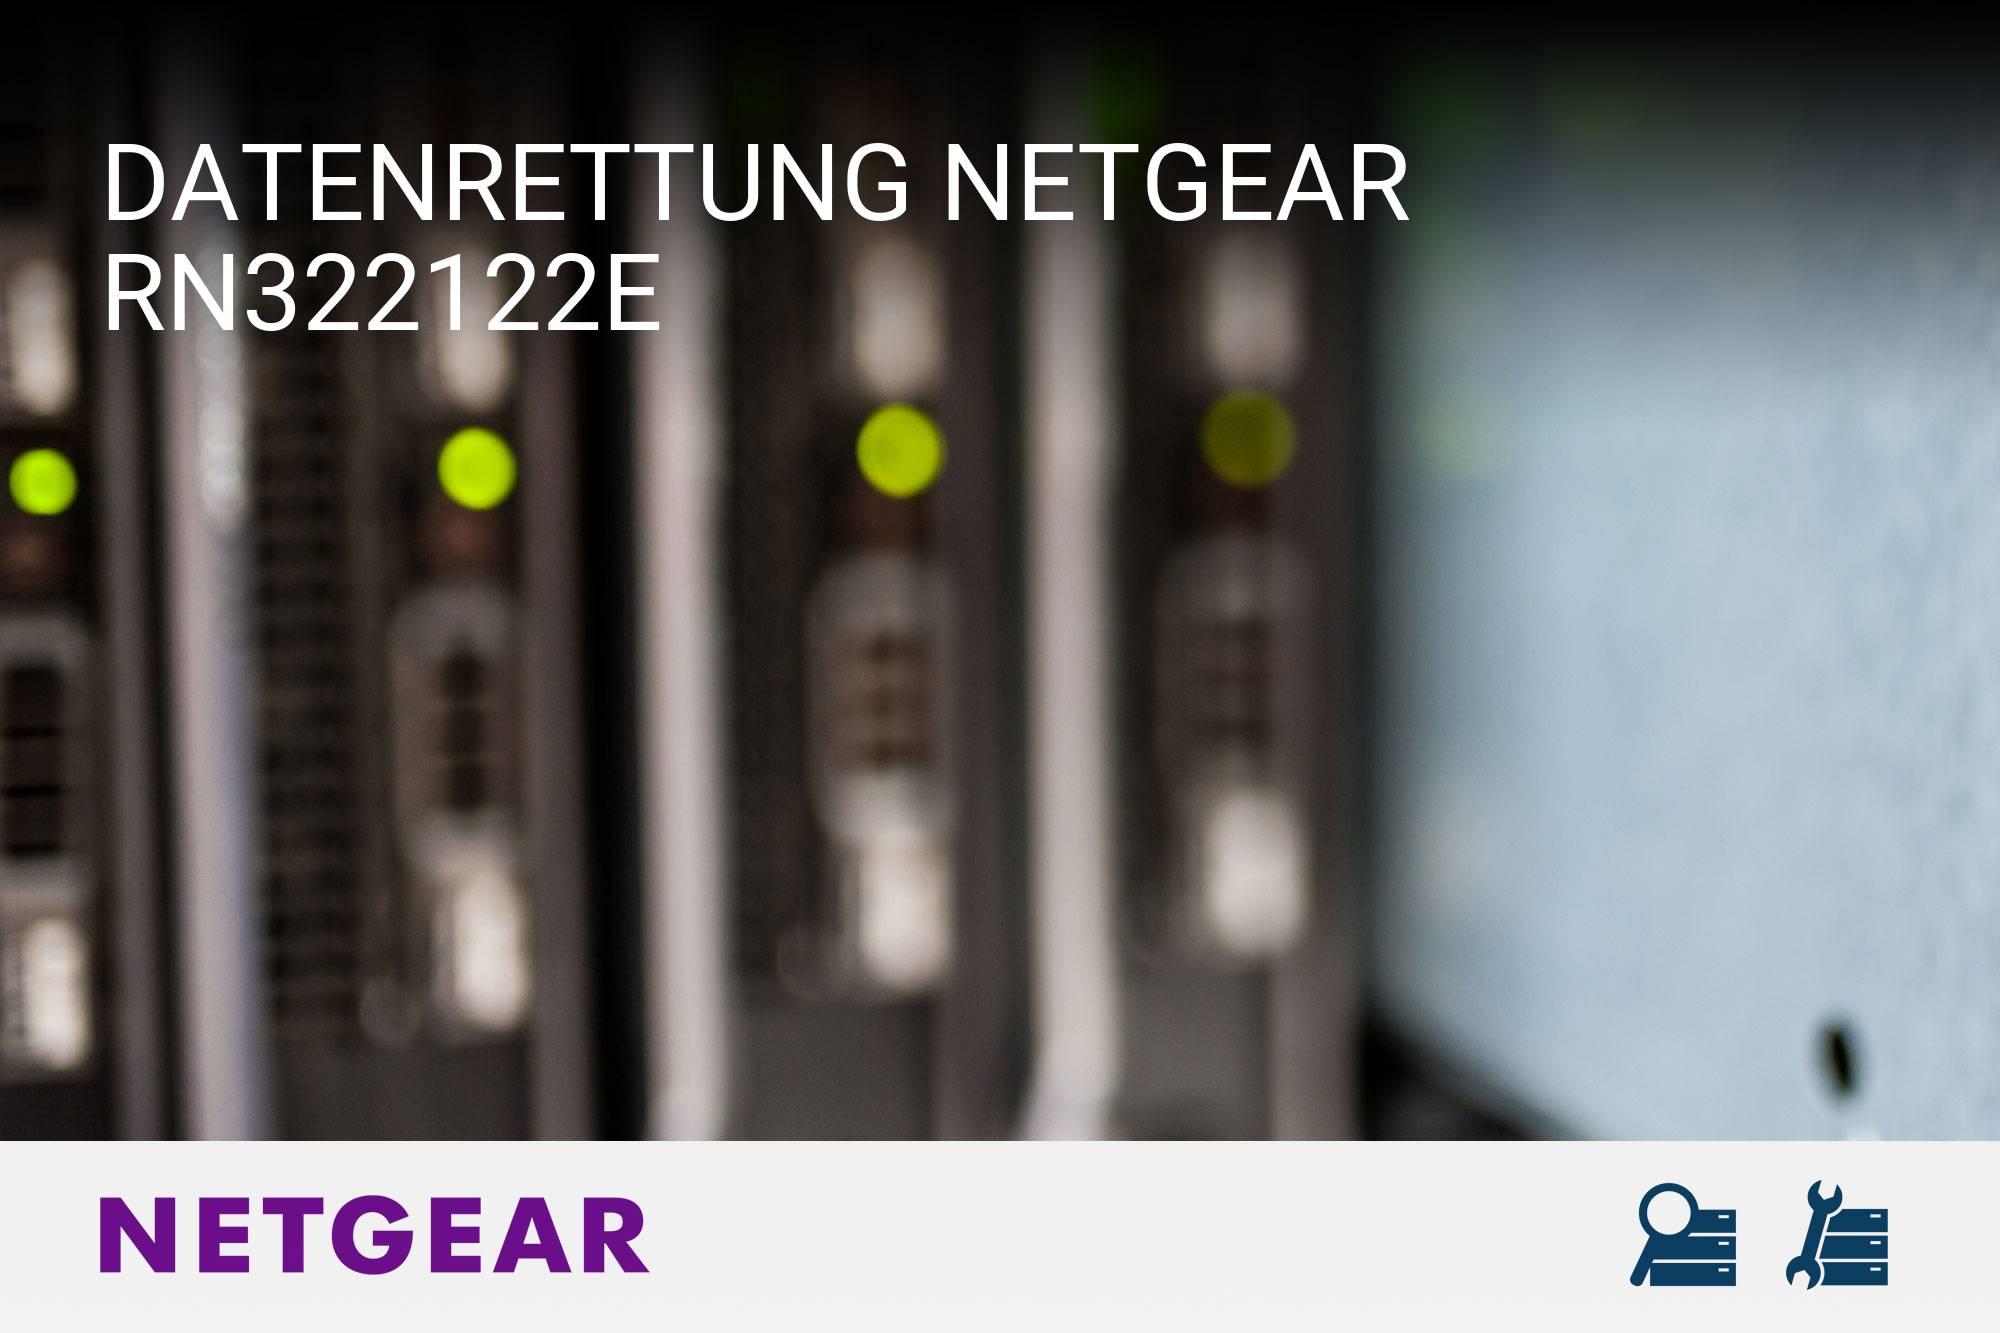 Netgear RN322122E